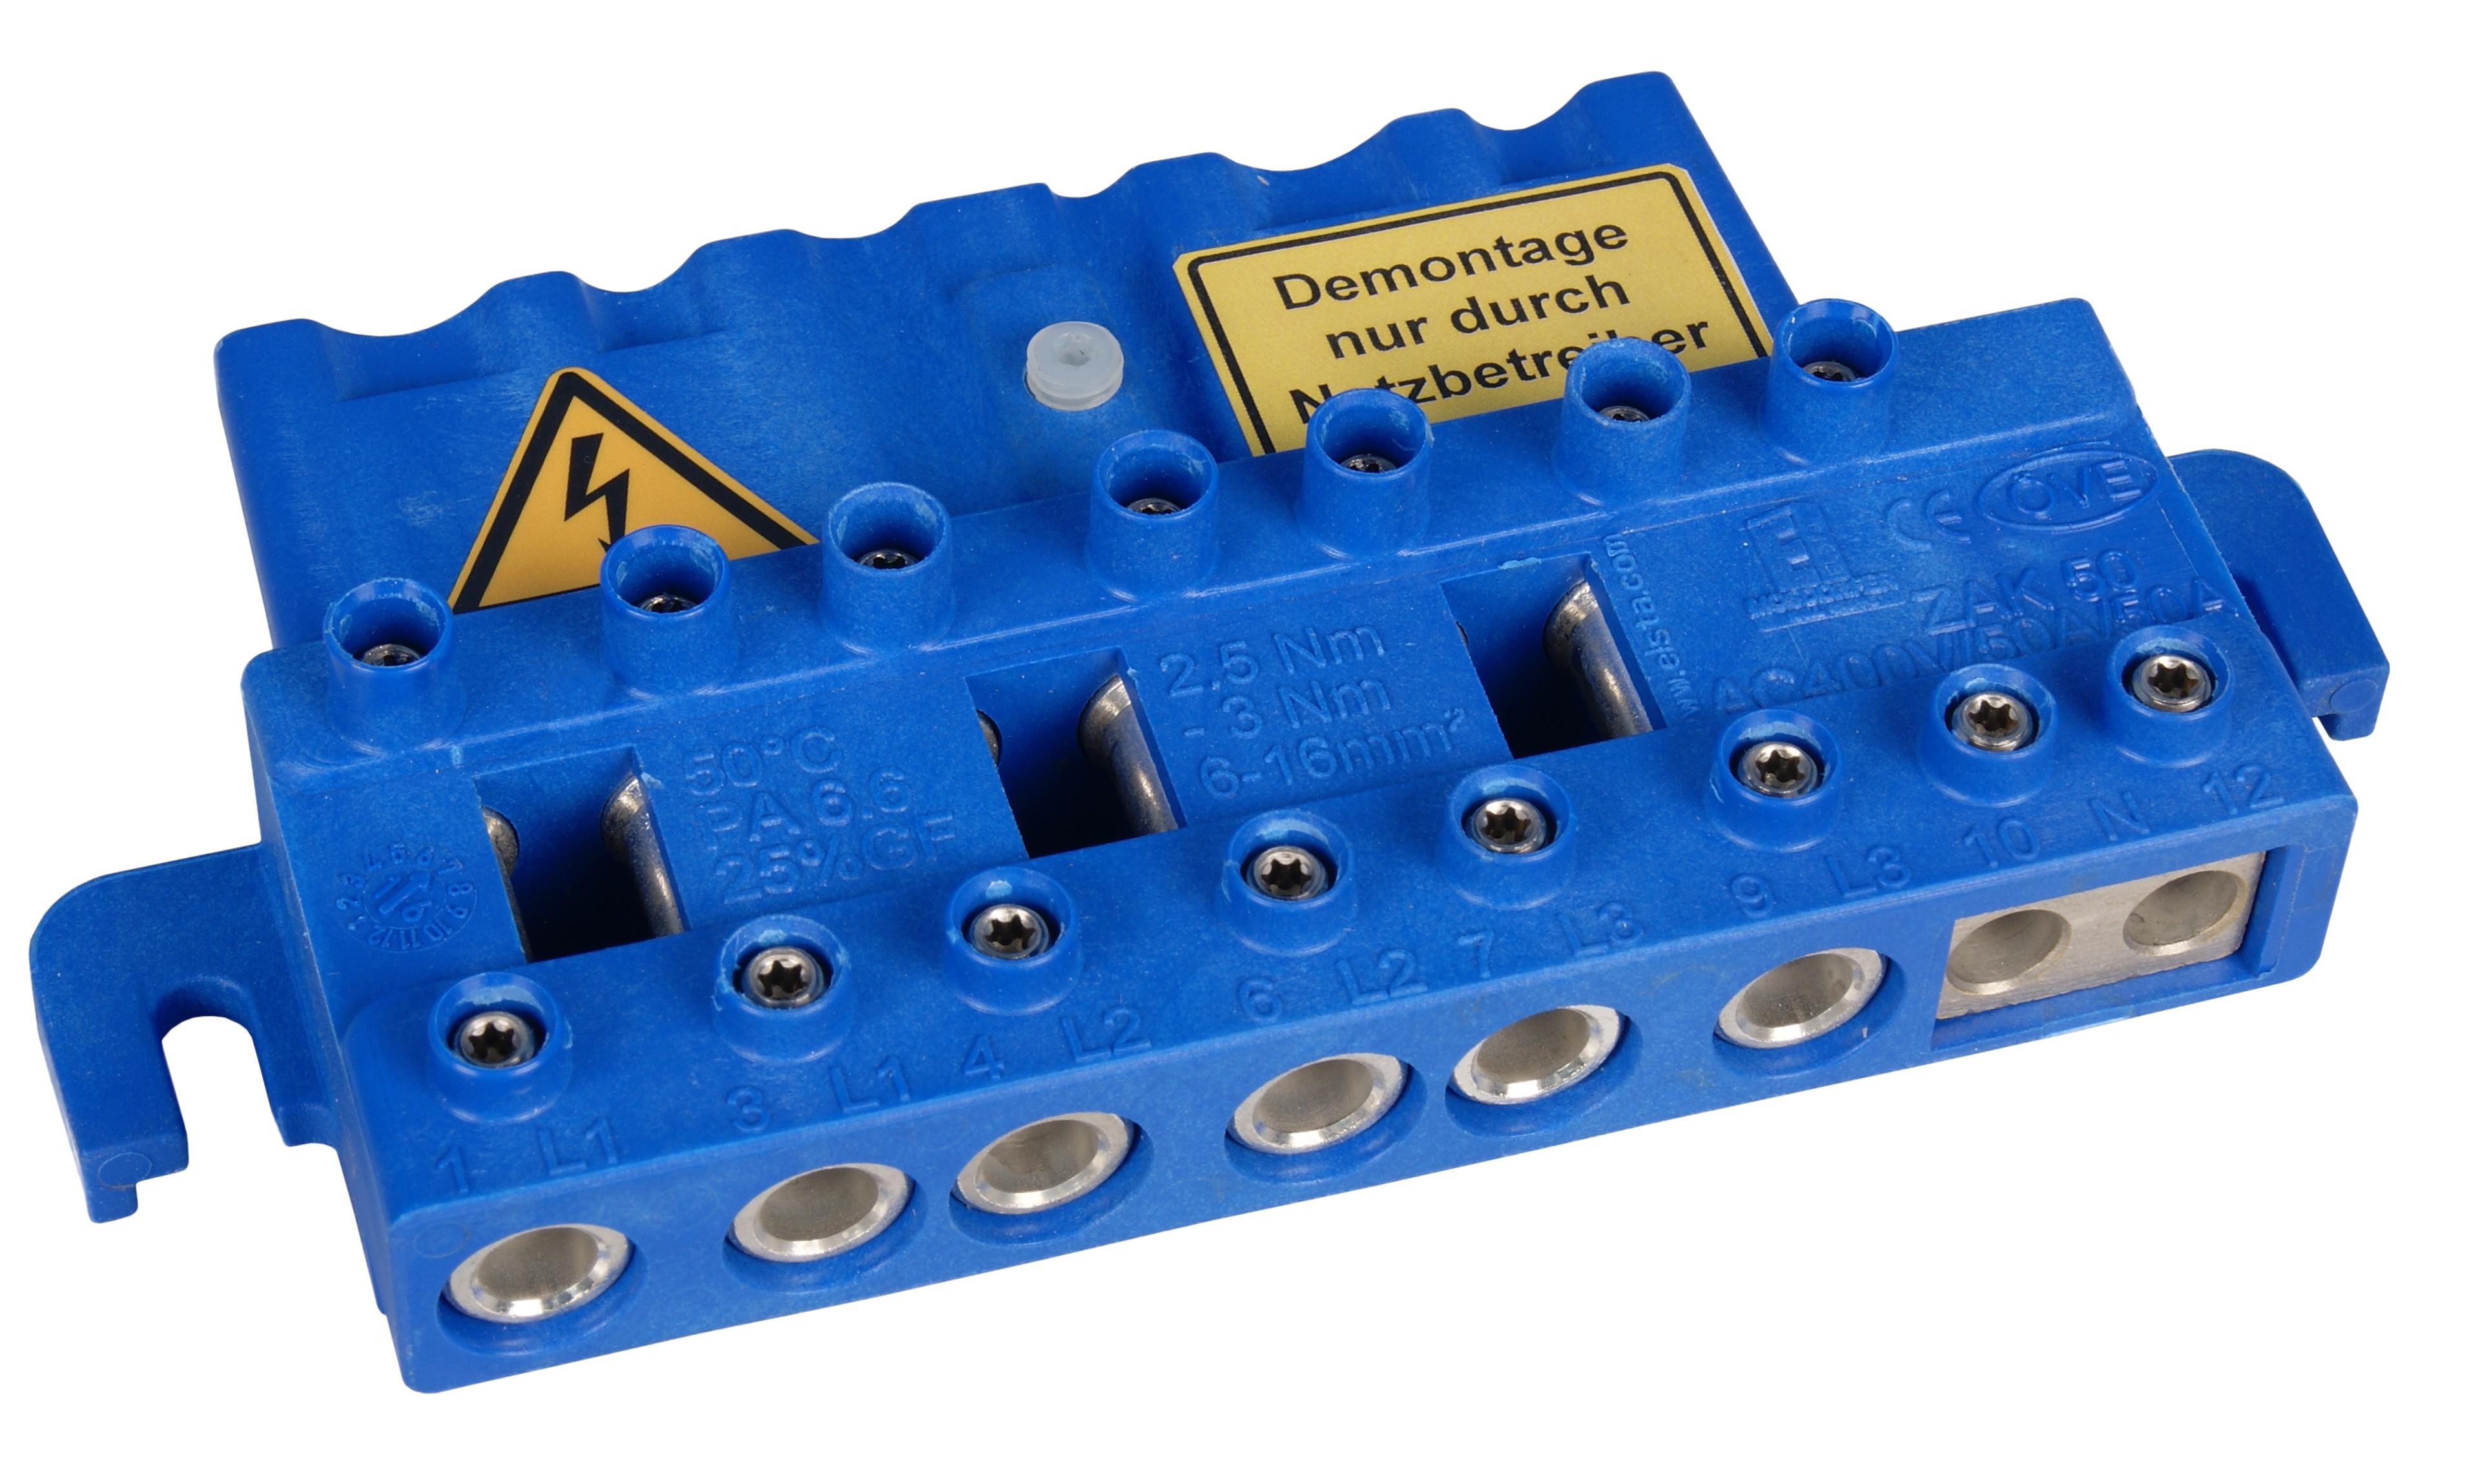 1 Stk 4-polige Zähleranschlussklemme  50A, Netz NÖ blau IL900176--